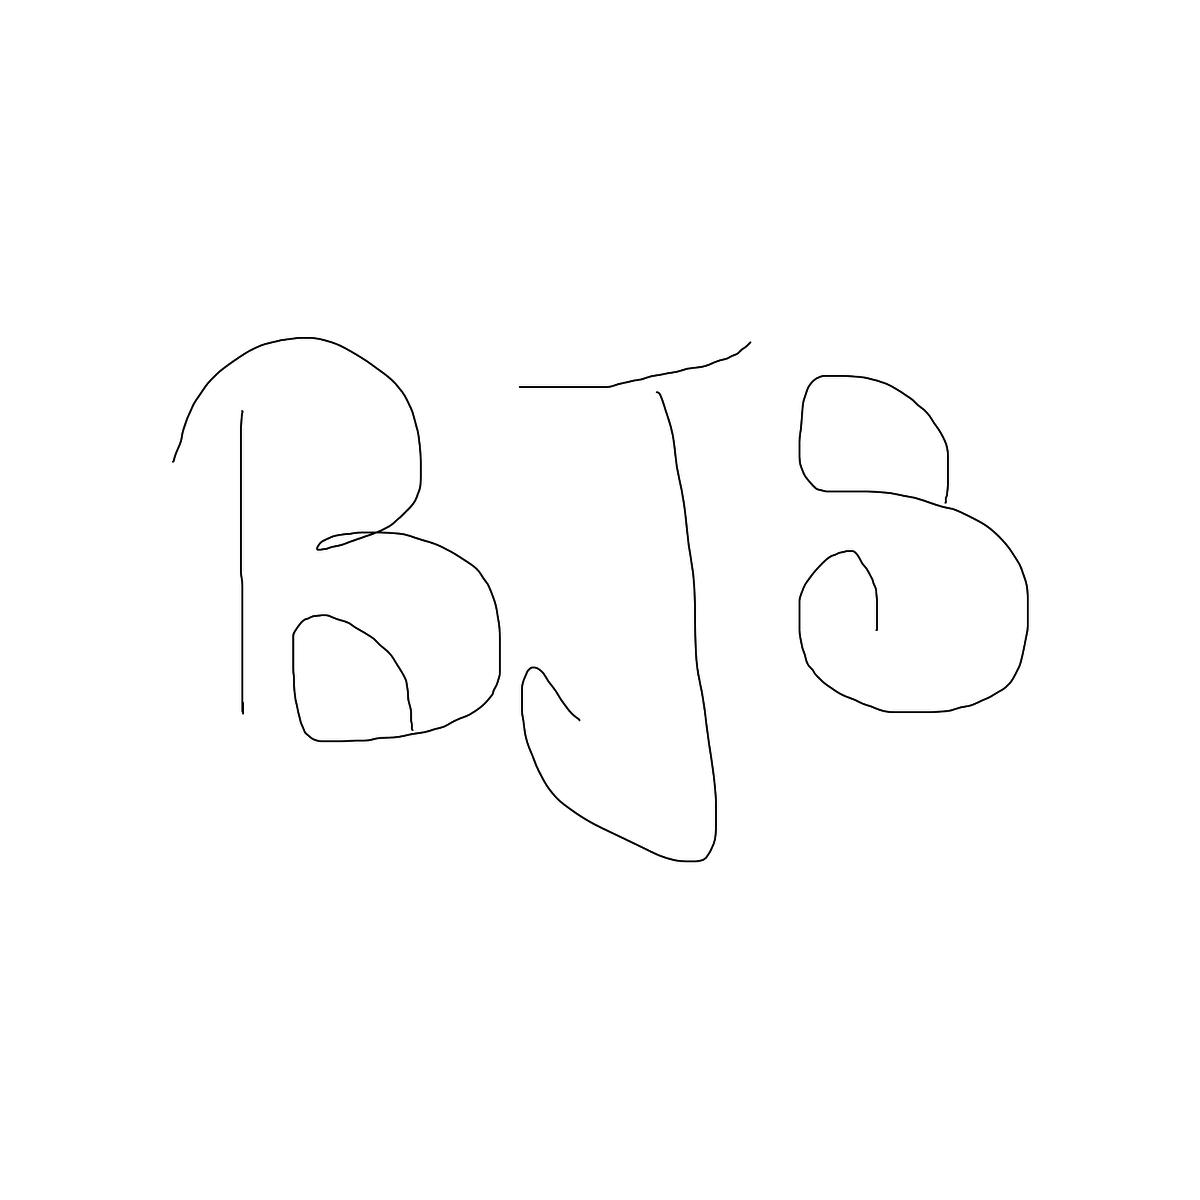 BAAAM drawing#1604 lat:32.8224792480468750lng: -96.7751464843750000